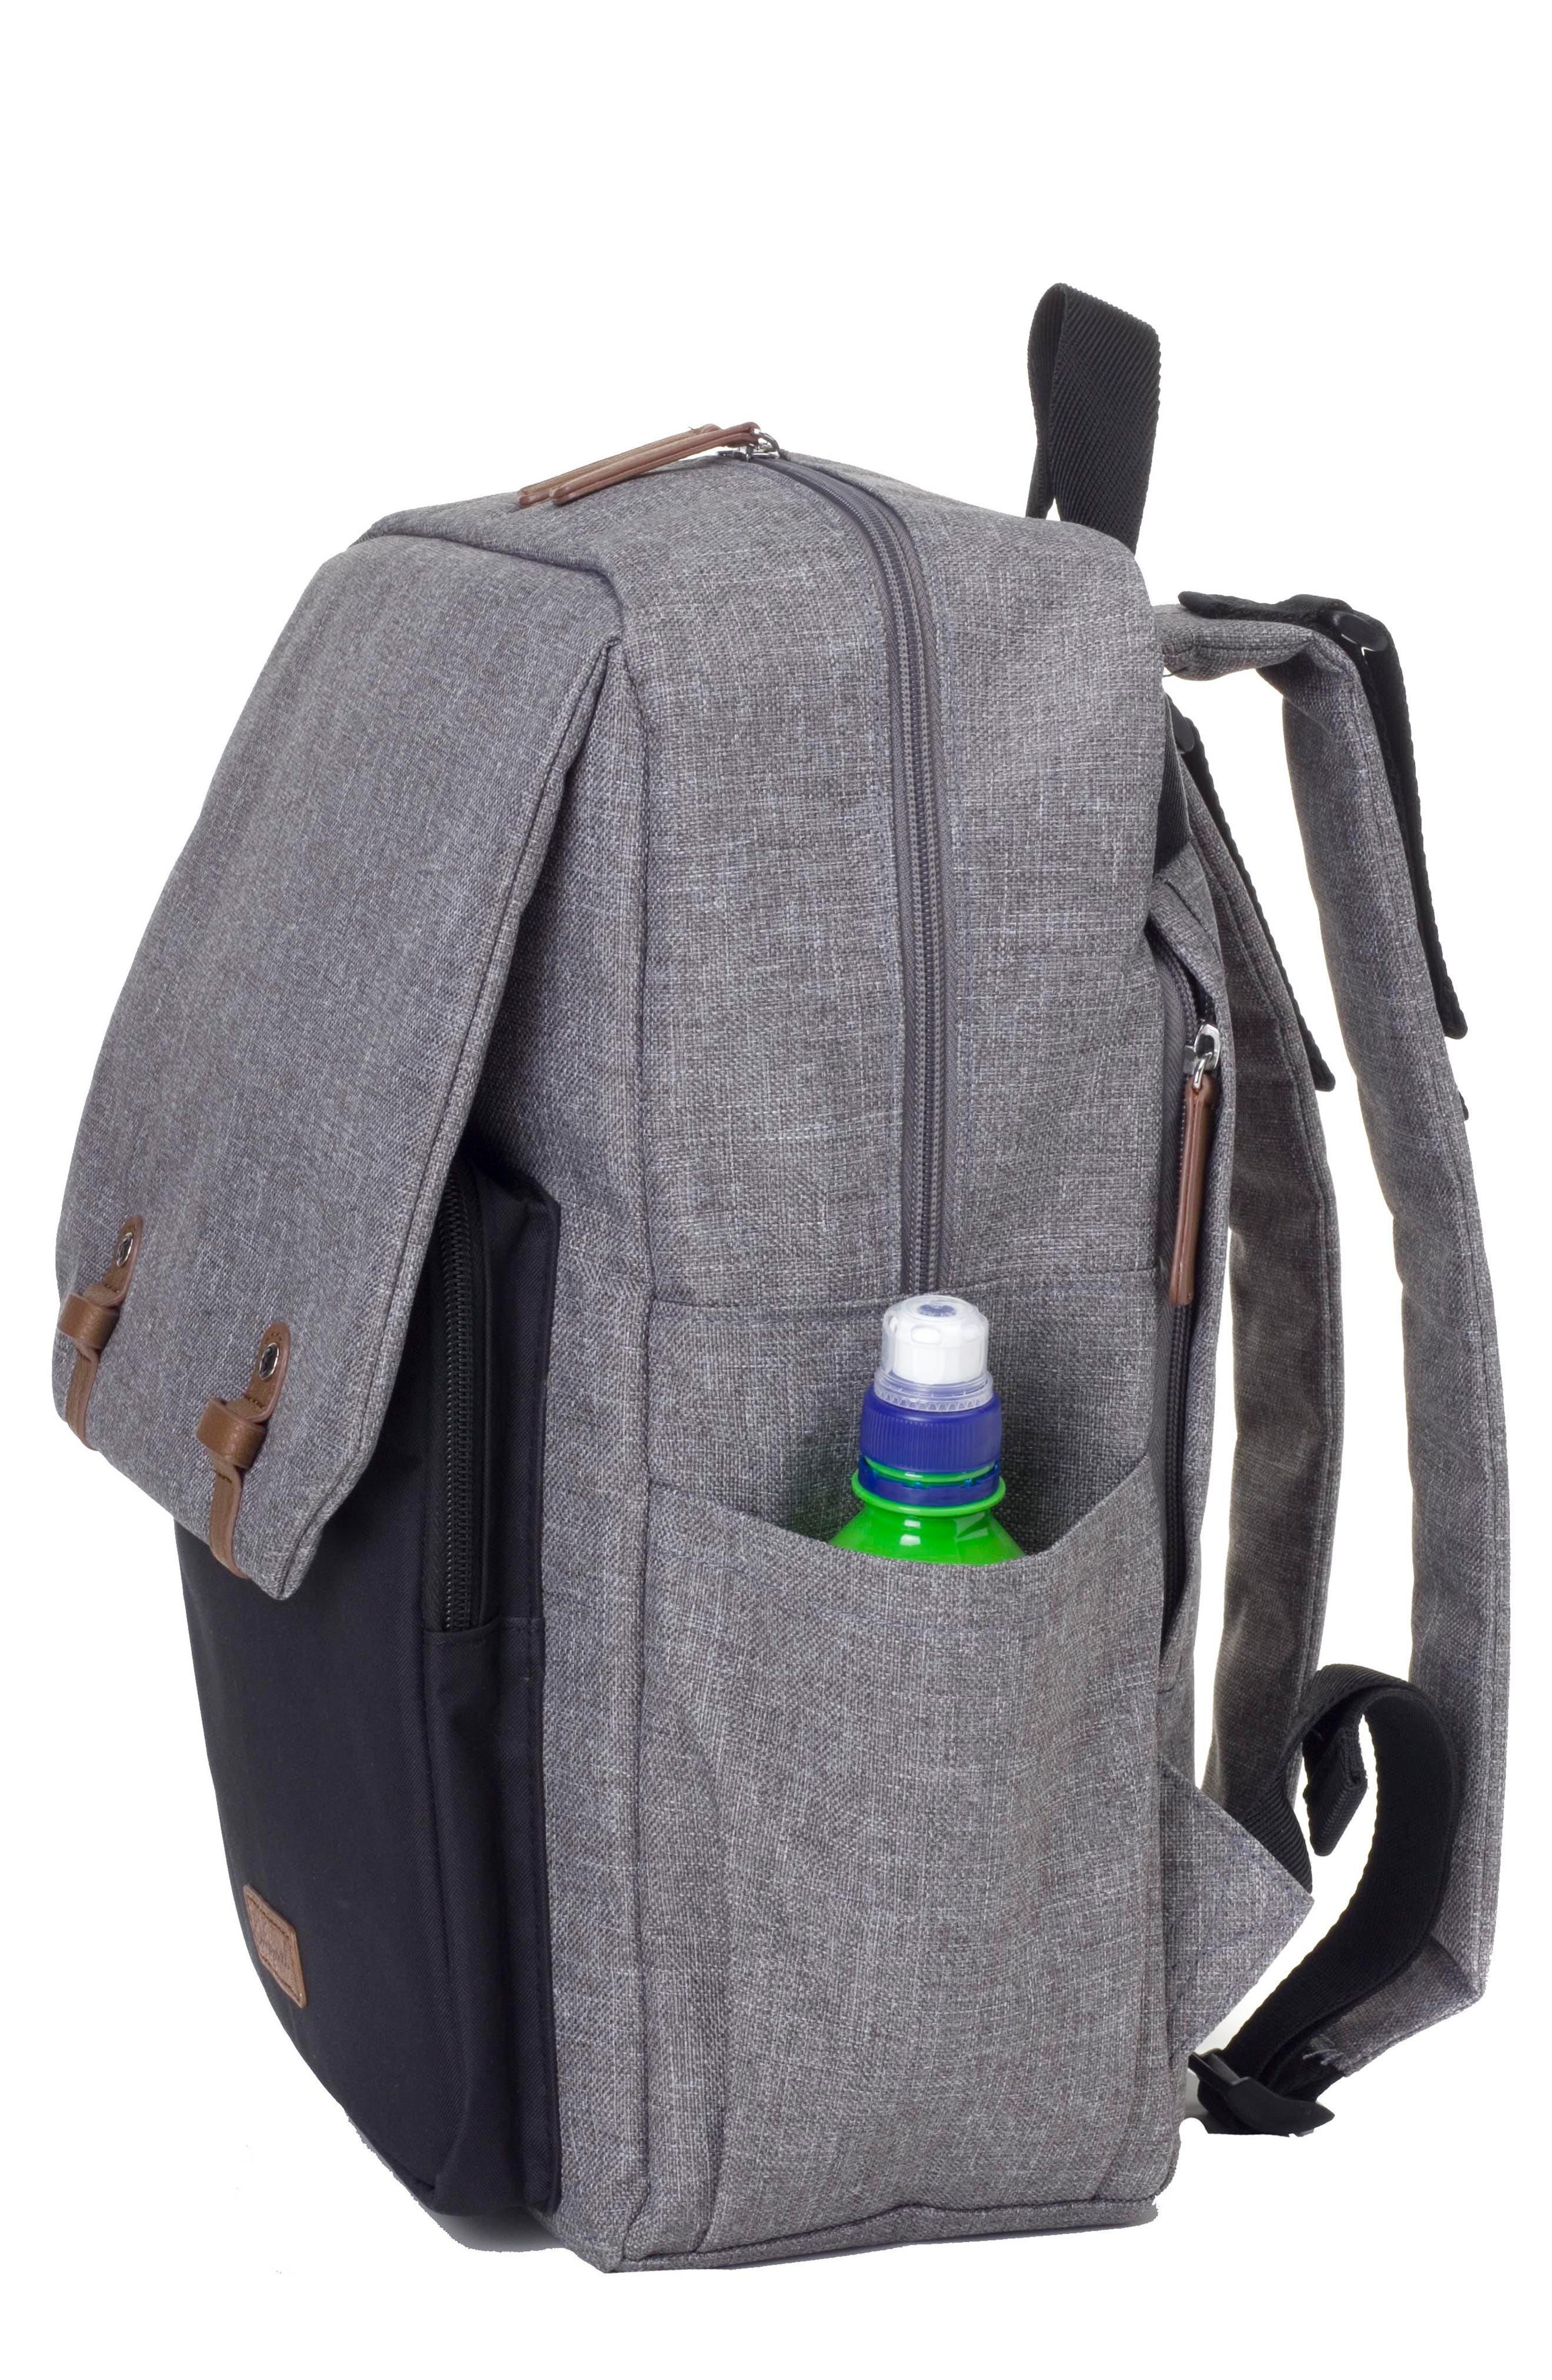 George Water Resistant Diaper Backpack,                             Alternate thumbnail 8, color,                             BLACK/ GREY